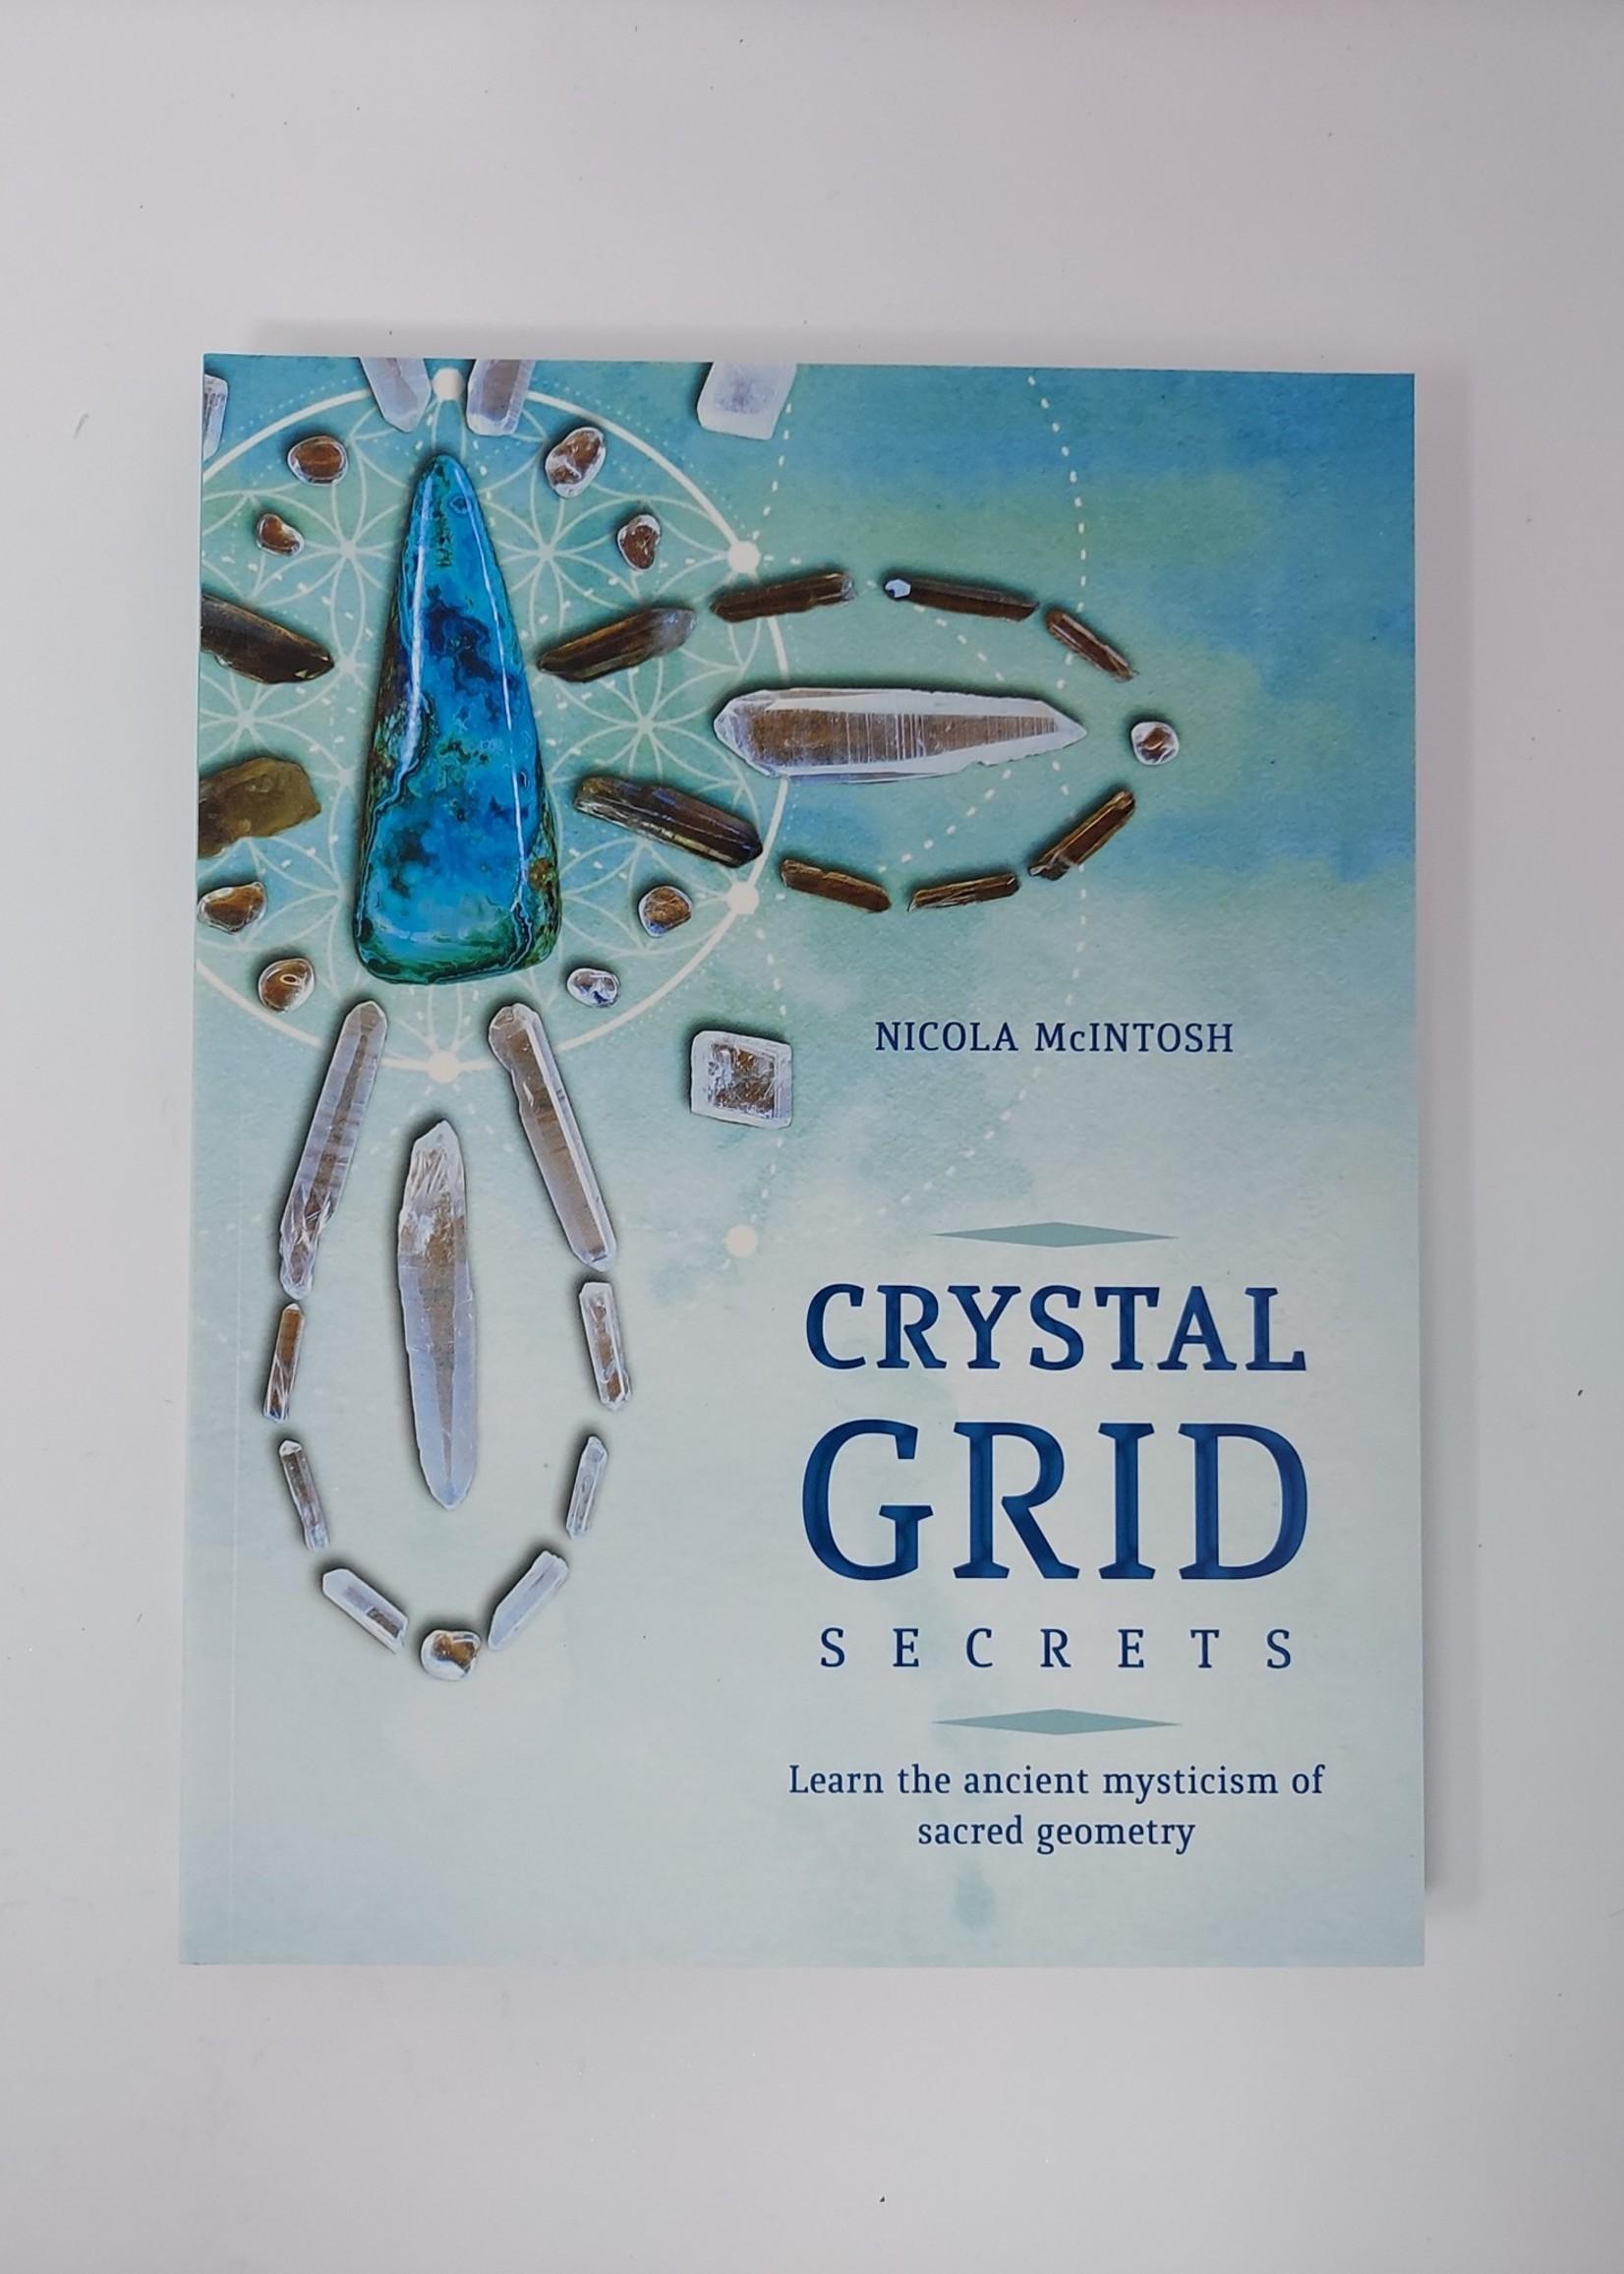 Crystal Grid Secrets Learn the Ancient Mysticism of Sacred Geometry - Nicola McIntosh